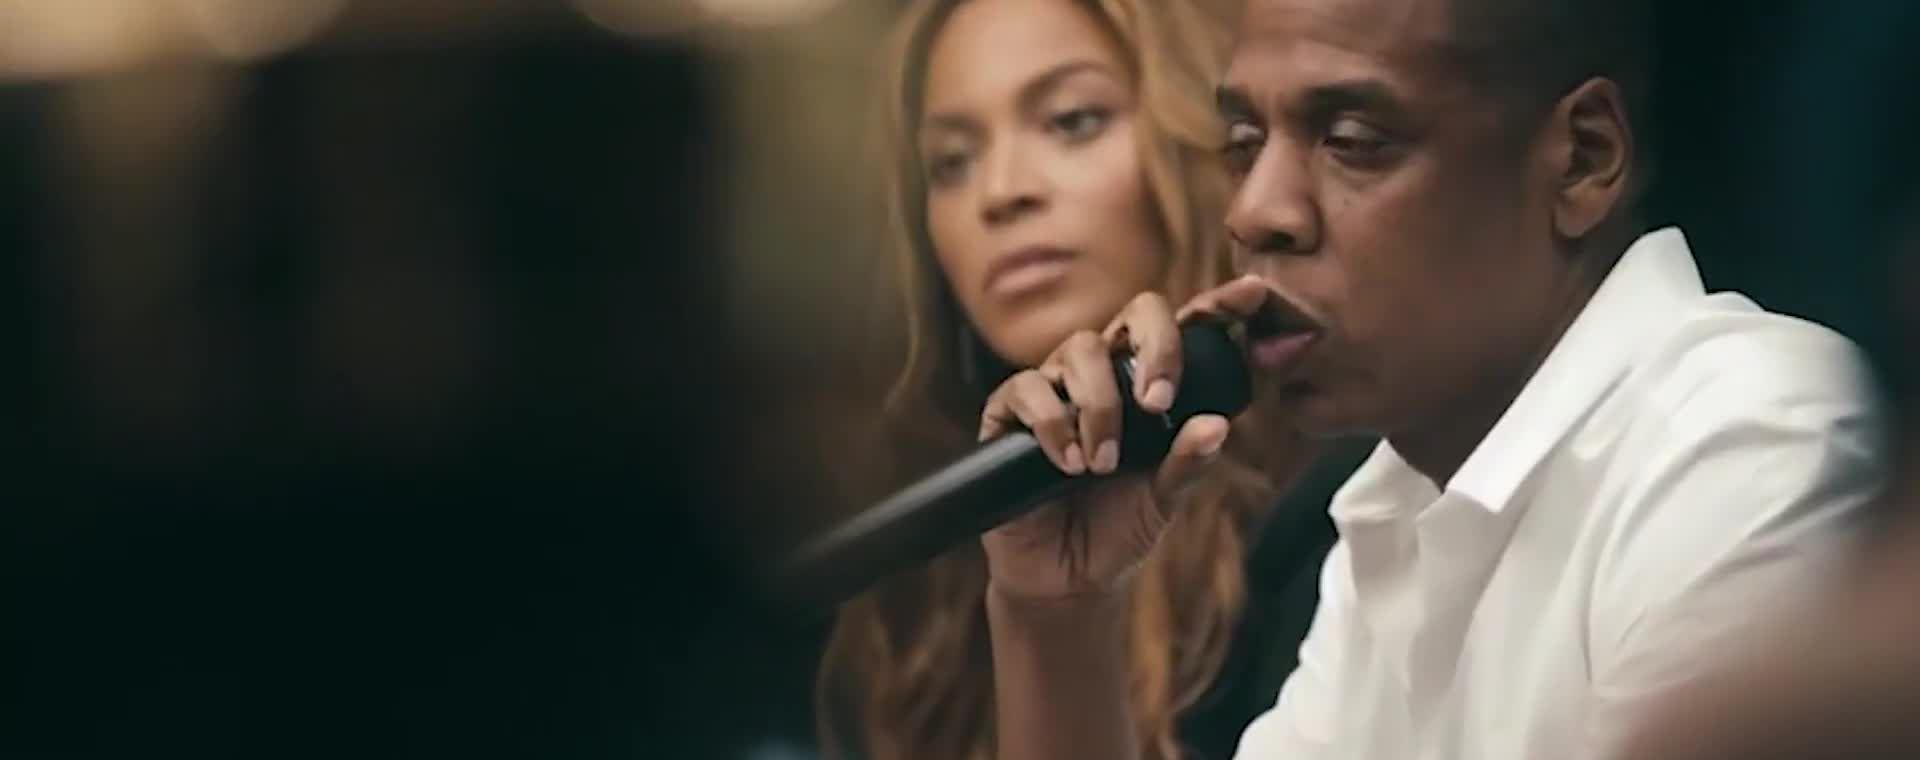 BITIMAG 23/08/2020 Beyonce & Jay Z Livin the Life